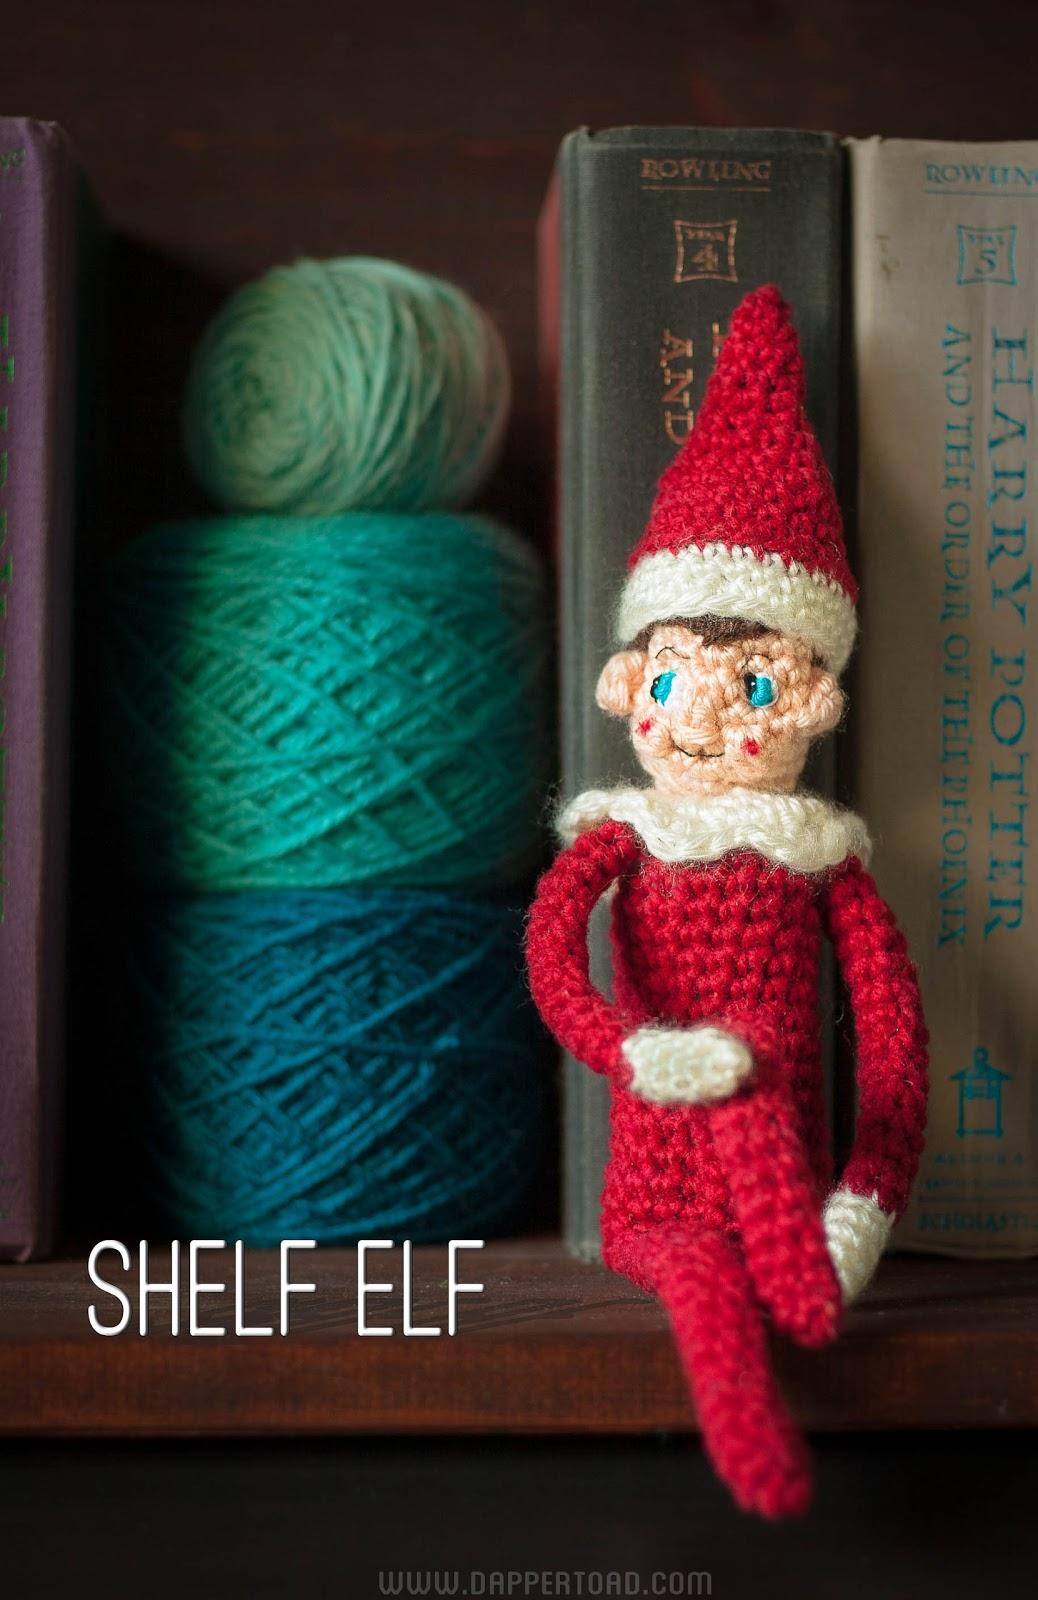 Free Knitting Pattern For Elves : The Dapper Toad: Sh(elf): Free Crochet Pattern